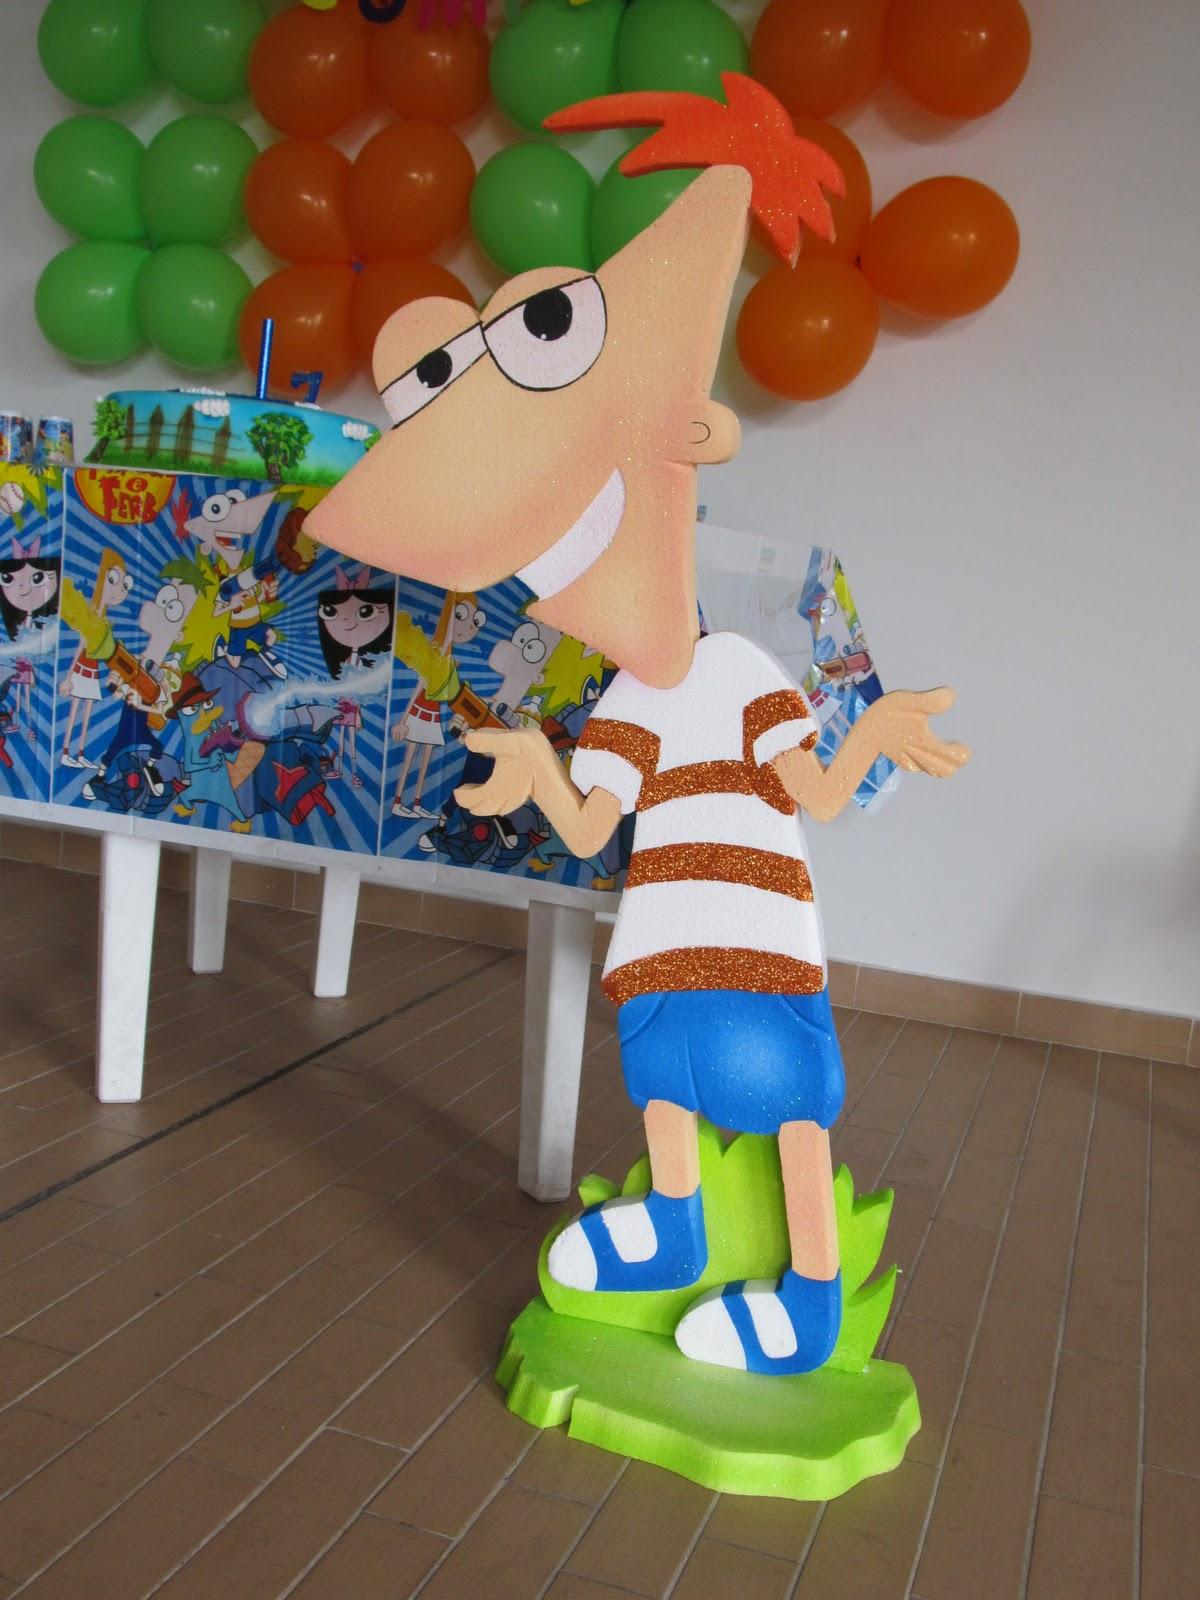 PHINEAS AND FERB DECORACION FIESTA CUMPLEAÑOS | Fiestas infantiles ...